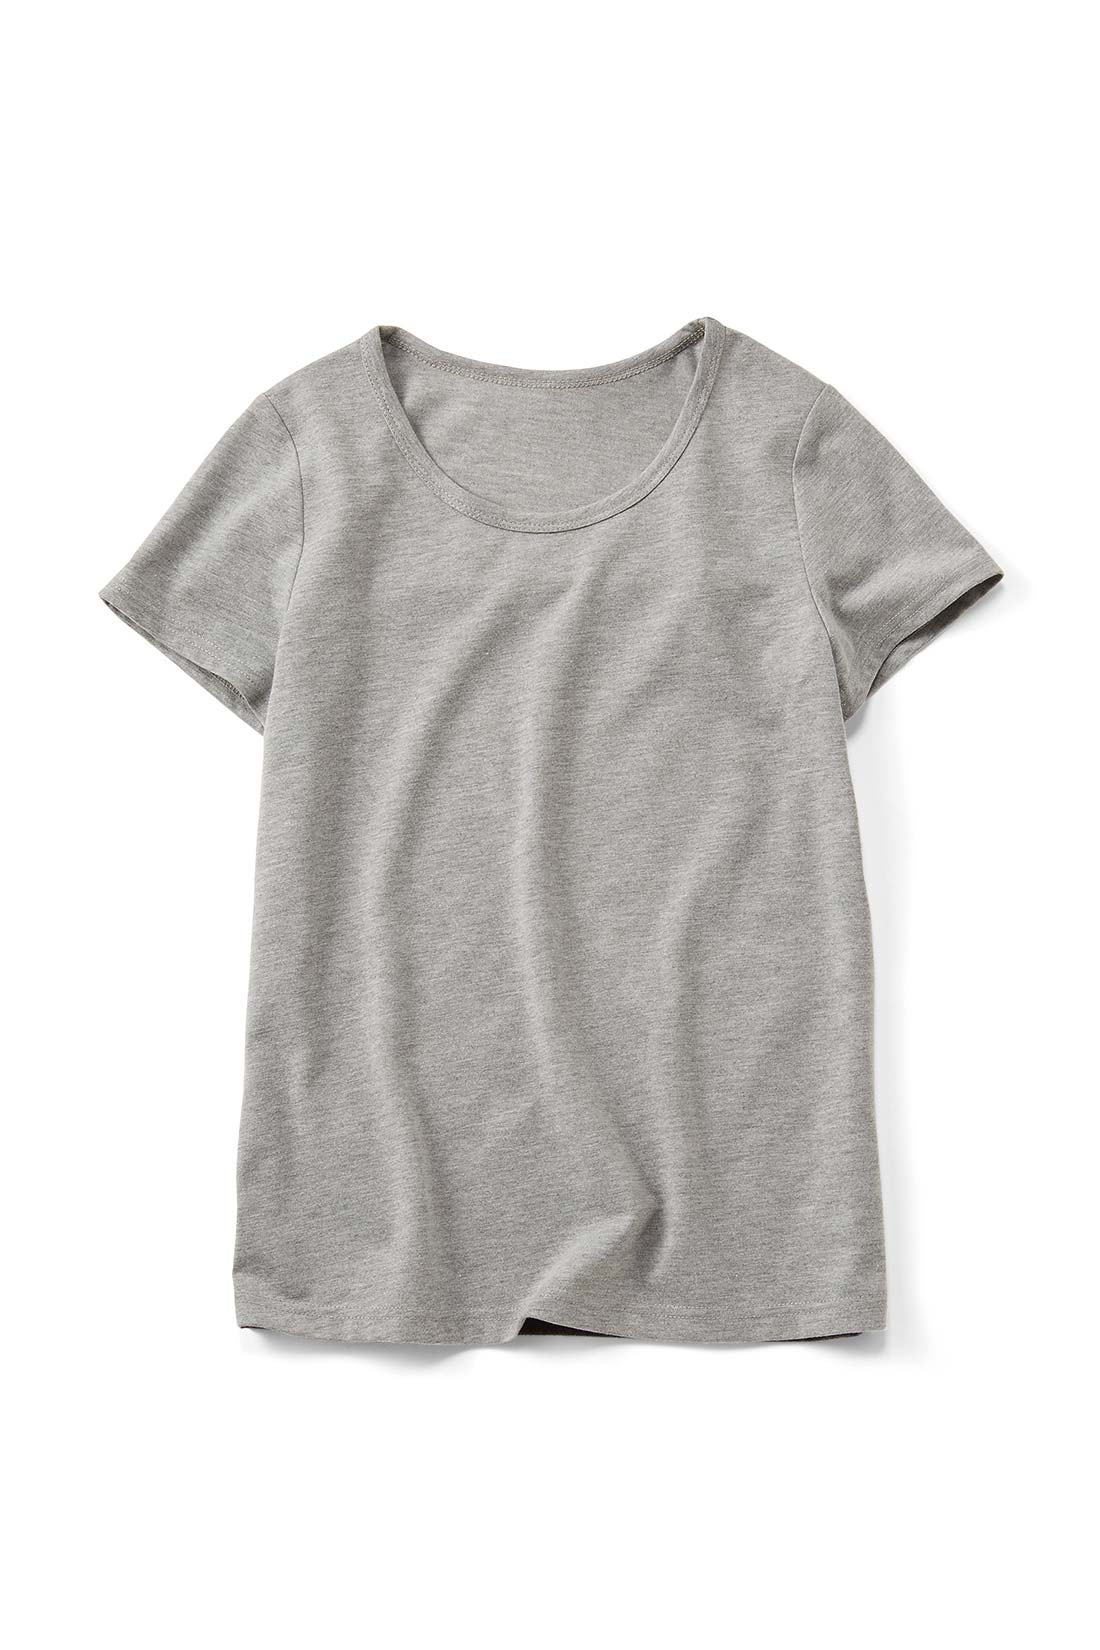 Front 前は袖と同色のシンプルなデザイン。